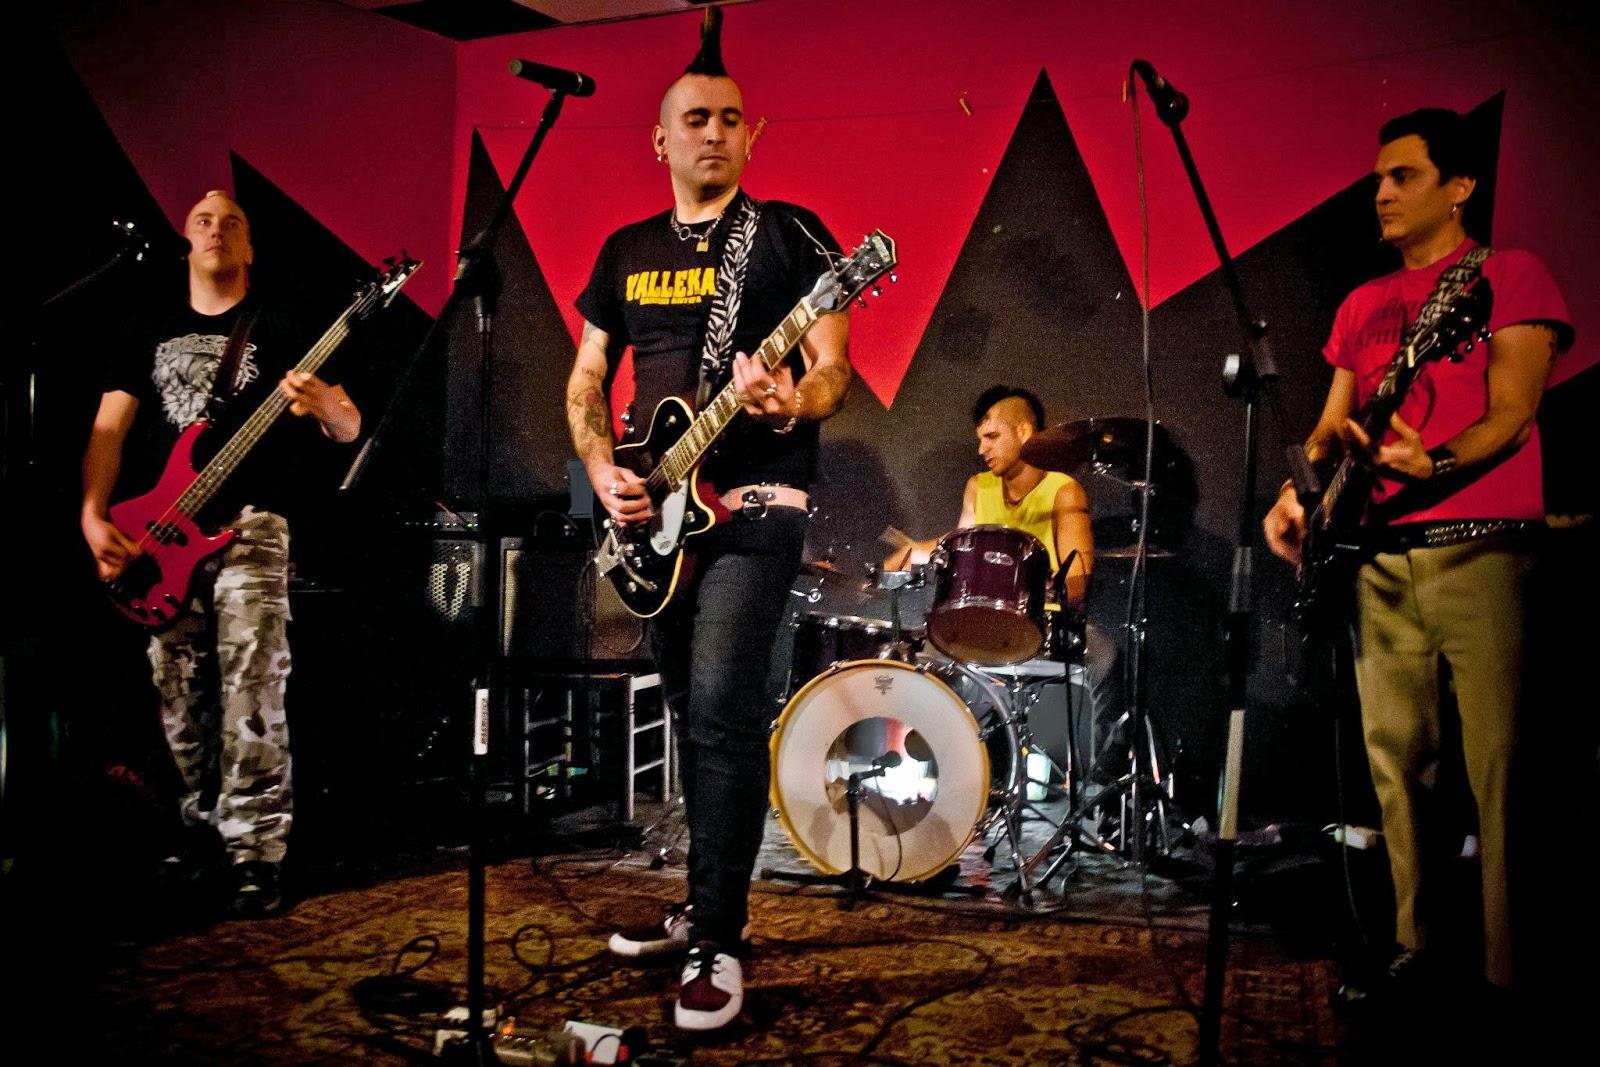 http://punkexpress.com/content.php/615-SUZIO-13-SARTENAZO-en-el-MasMusica-en-Avila